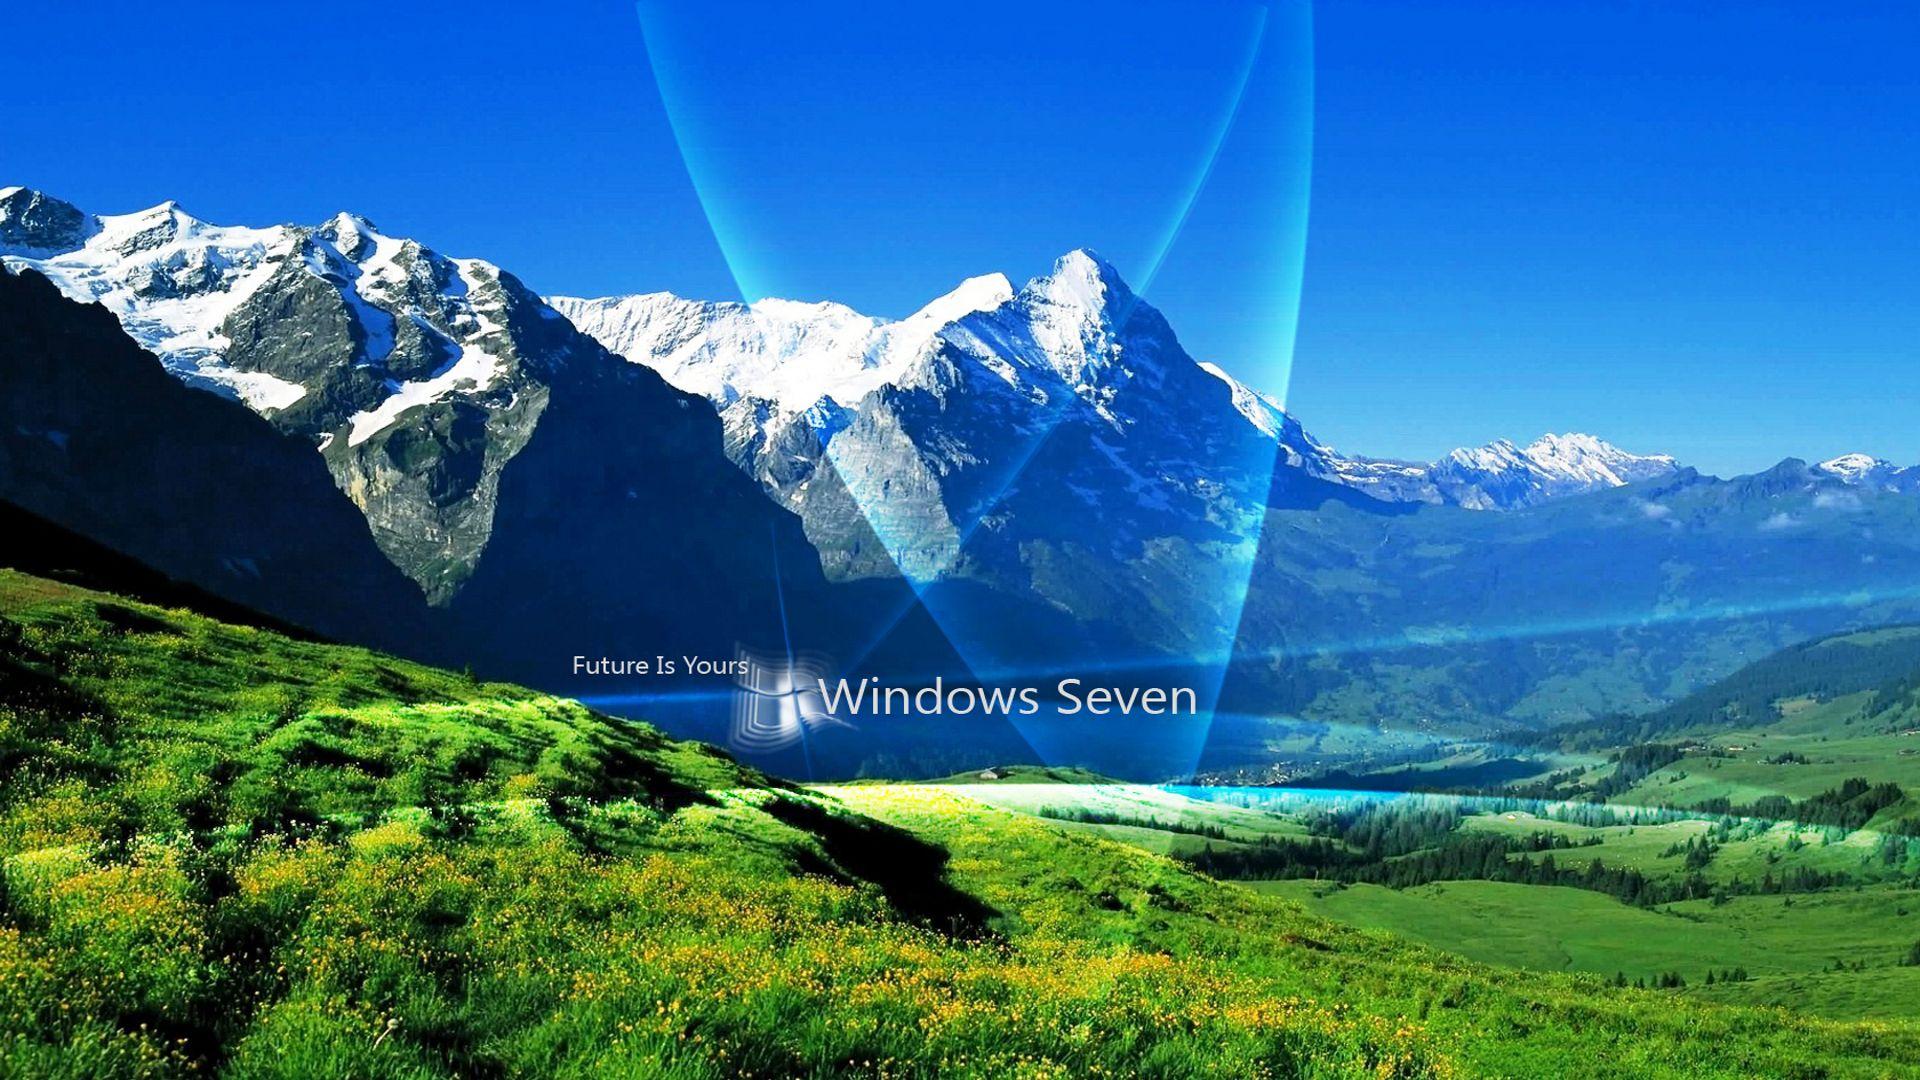 Windows 7 Wallpapers Backgrounds 2020 Laptop Wallpaper Desktop Wallpapers Desktop Wallpapers Backgrounds Computer Wallpaper Hd